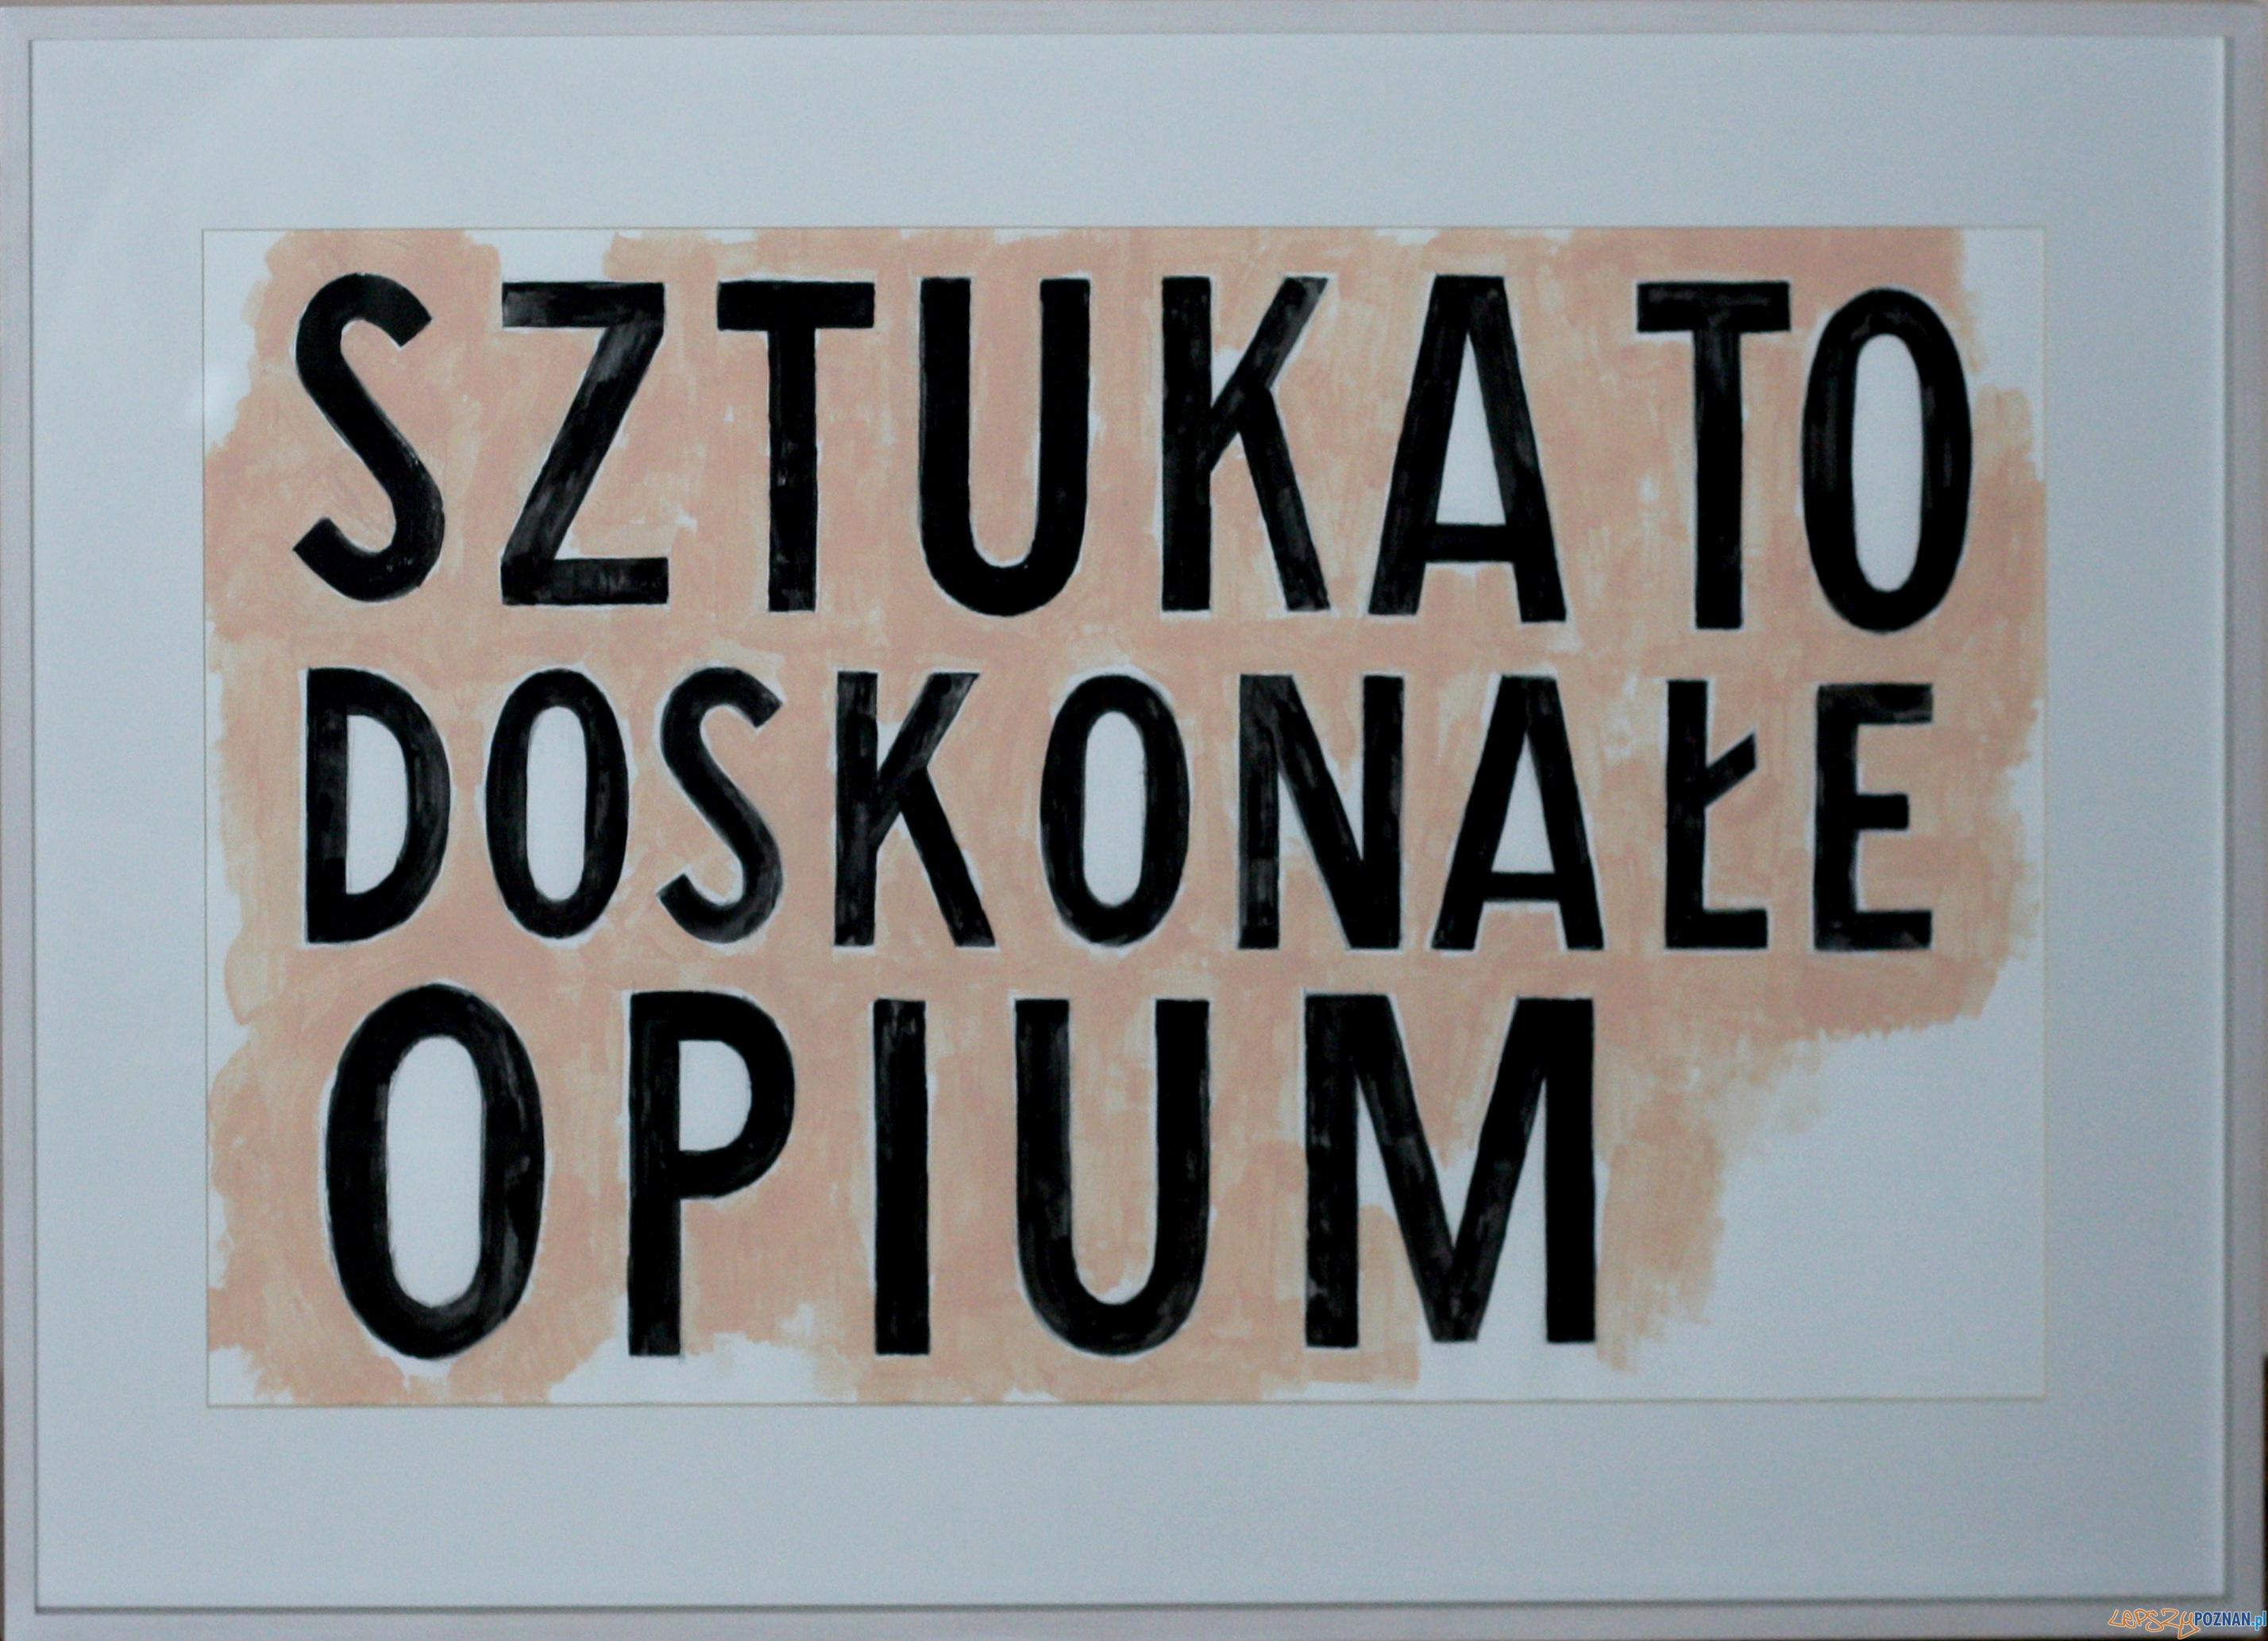 Sztuka to doskonałe opium  Foto: CK Zamek